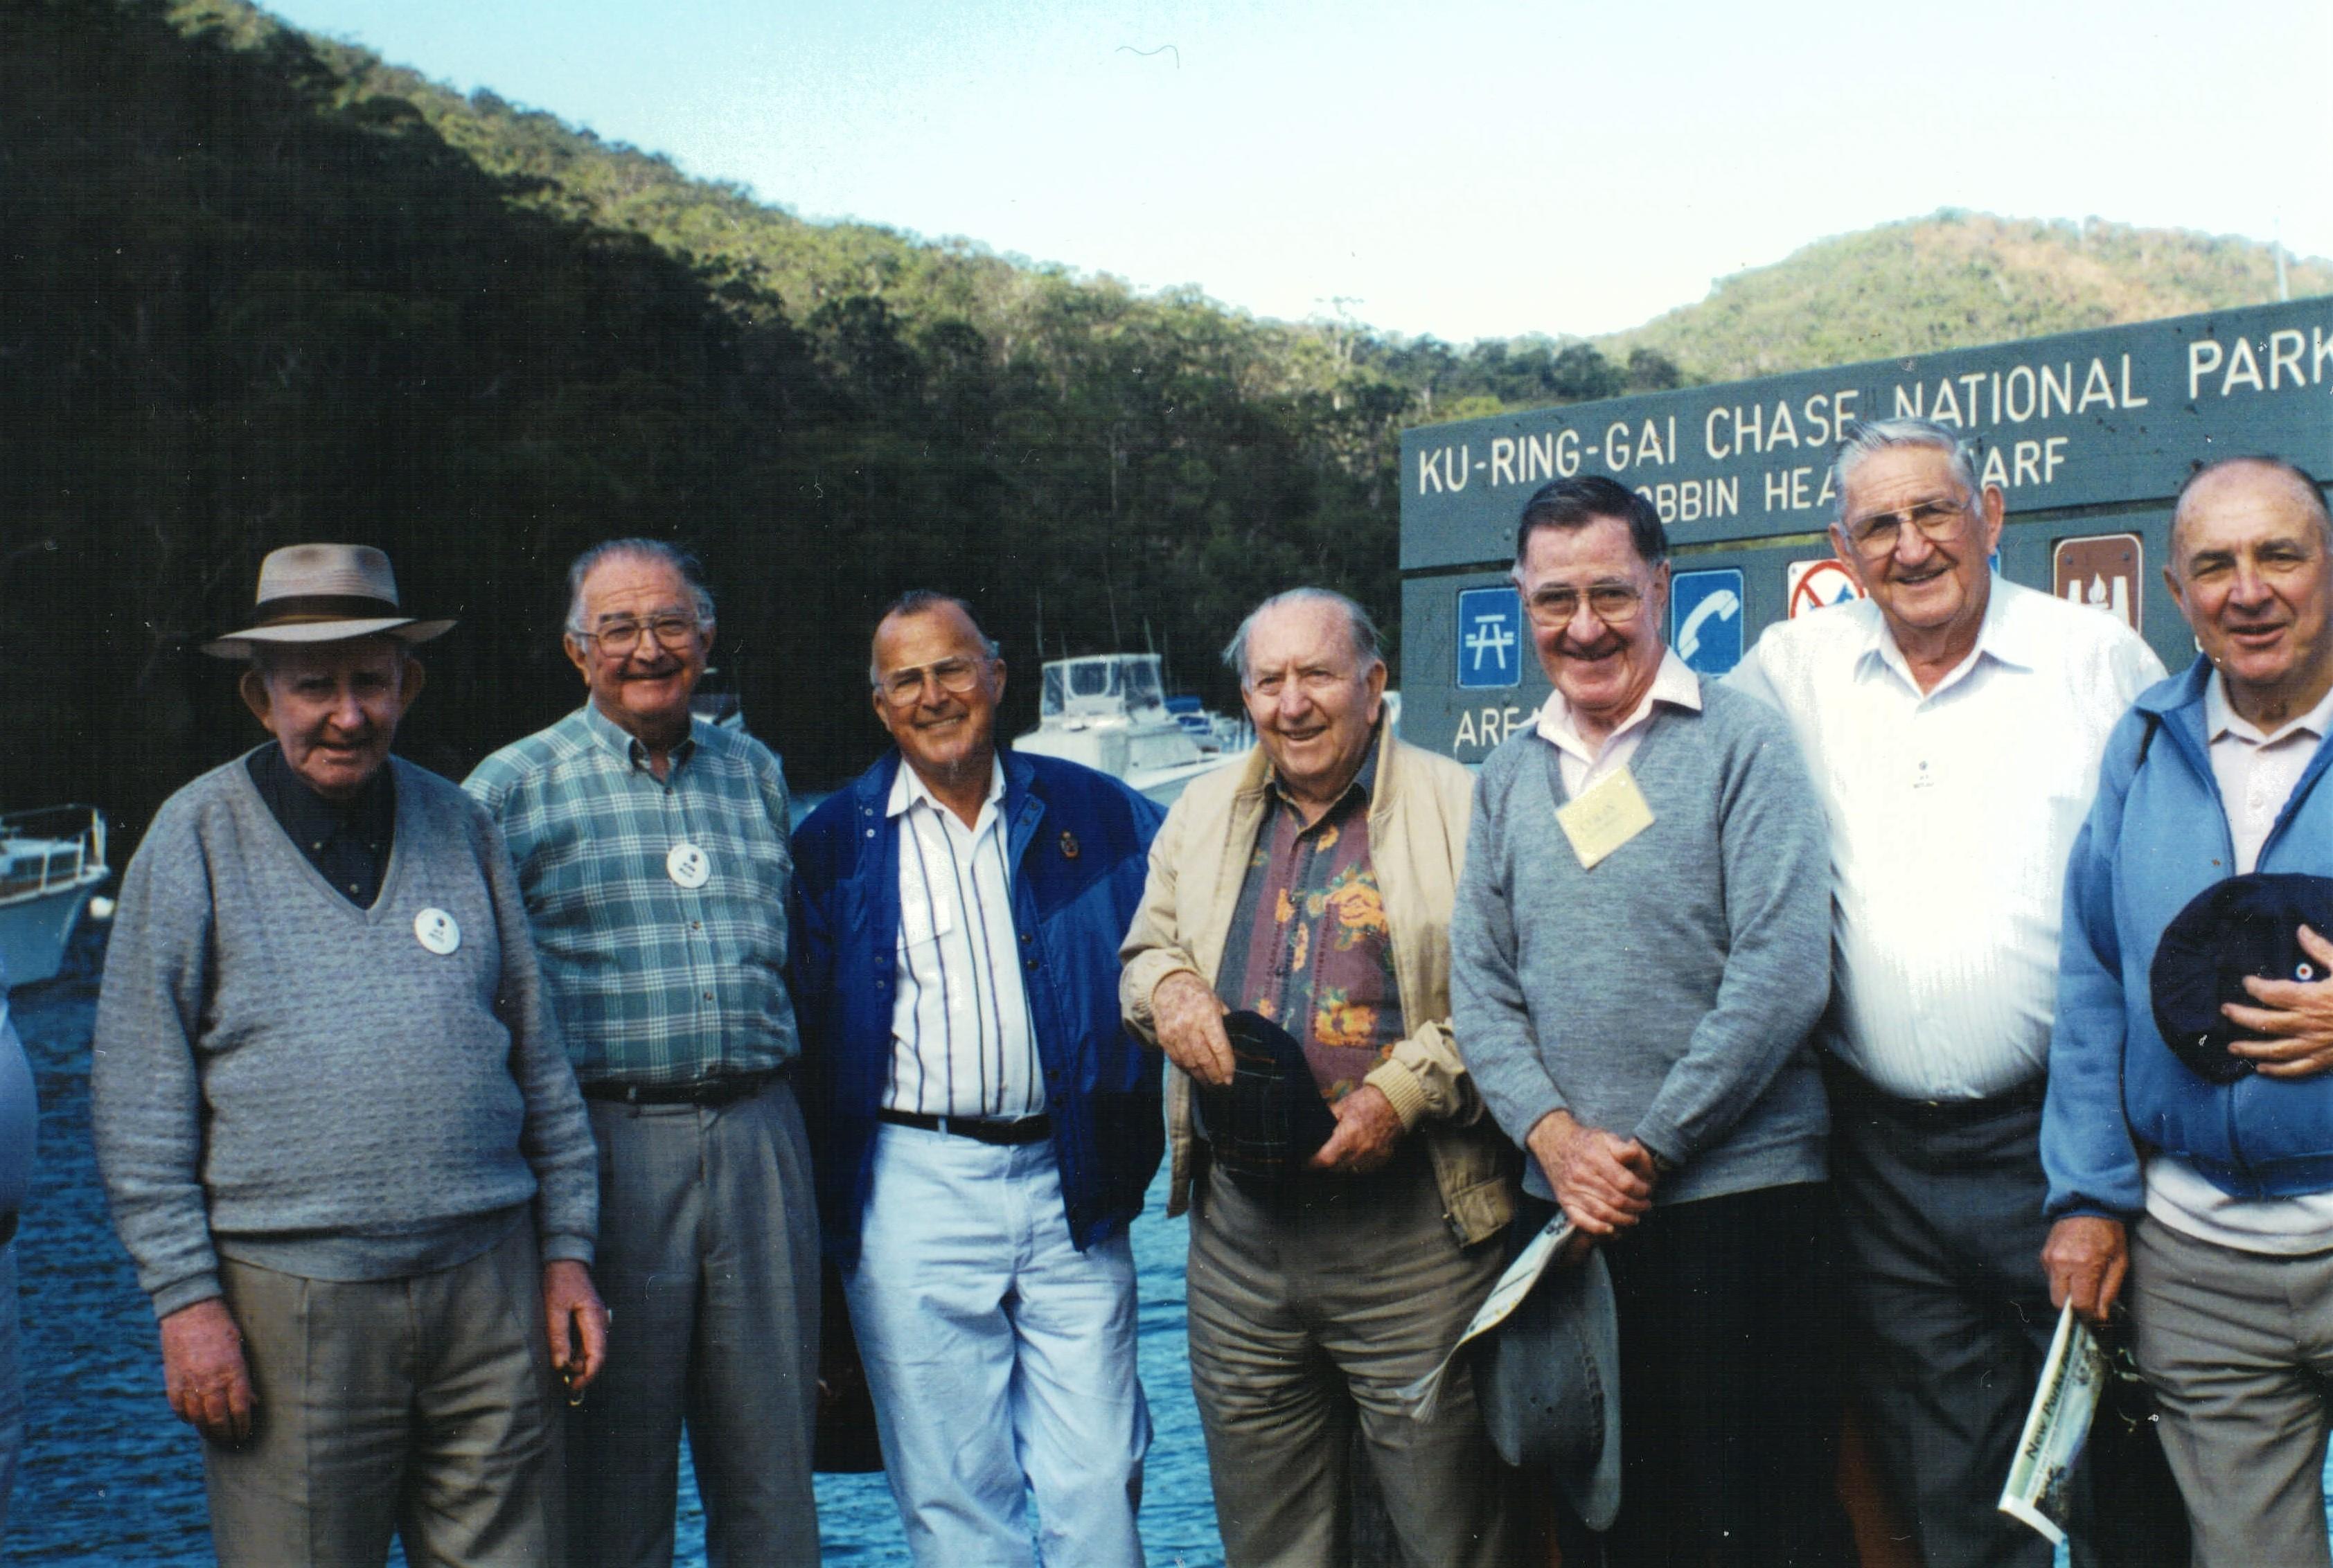 1997 Outings Cowan Waters Cruise 9-9-97.